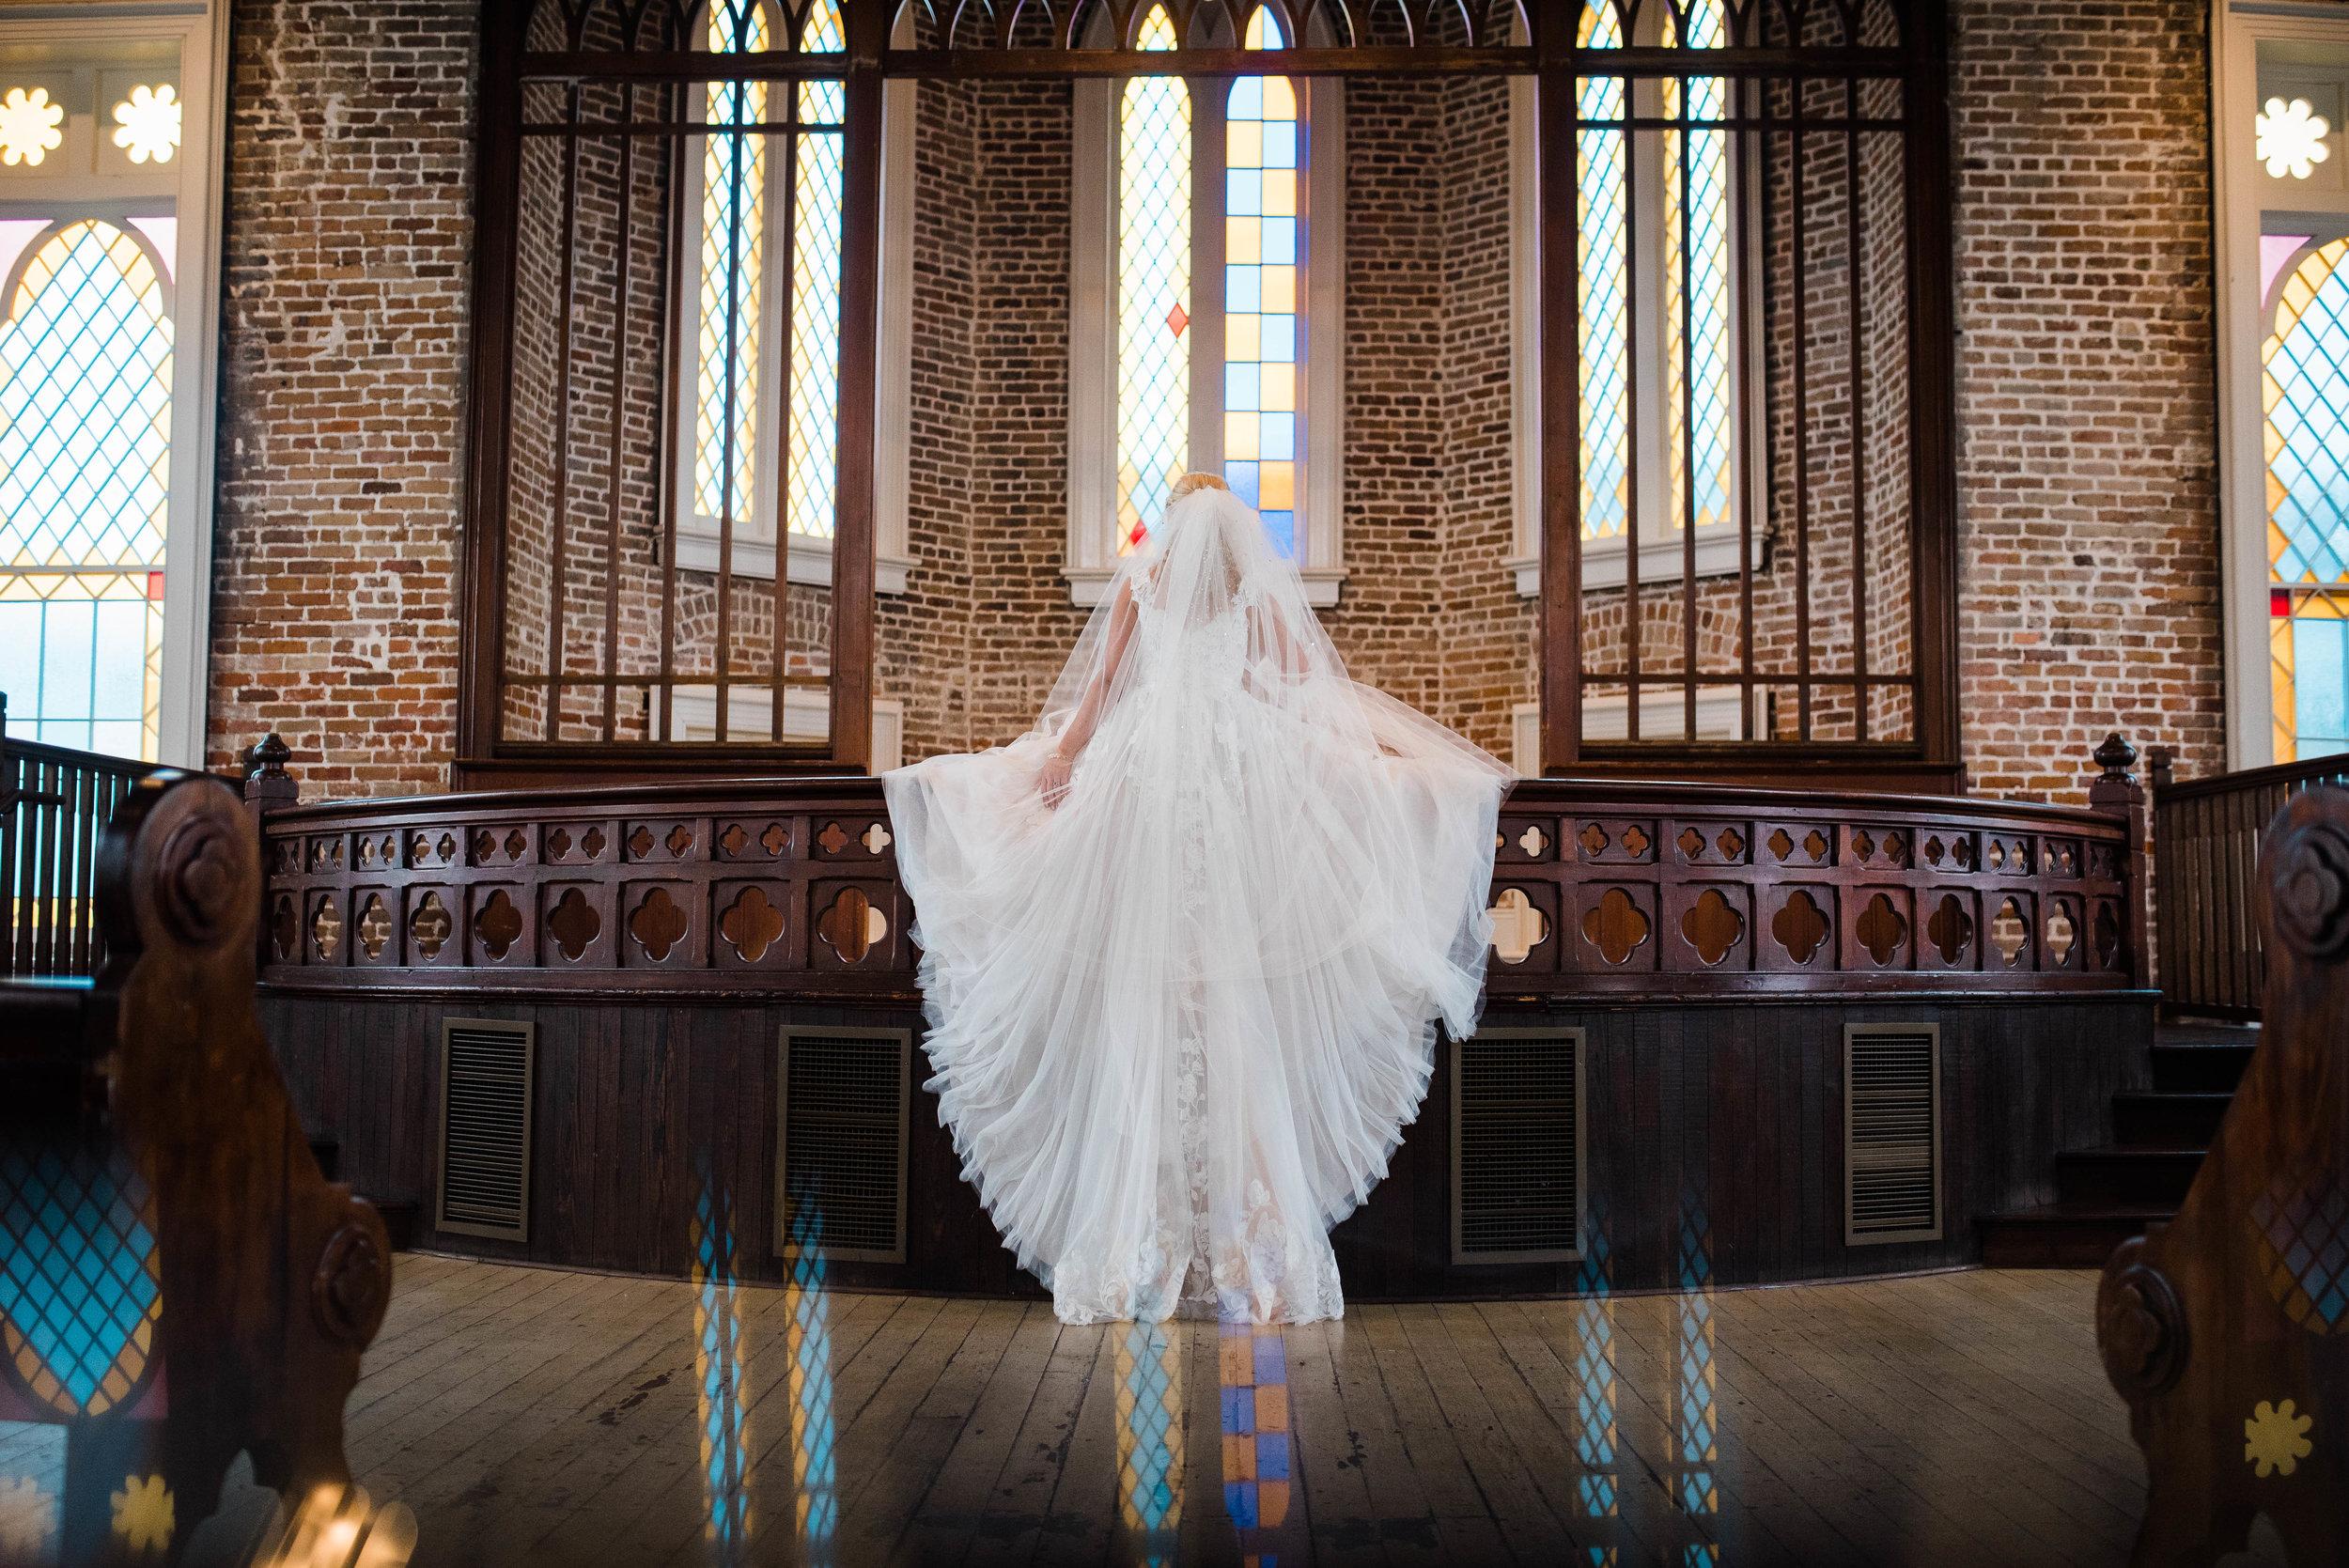 Kate-Felicity-Church-Bridal-Portraits_Gabby Chapin_Photography_Originals_00127.jpg